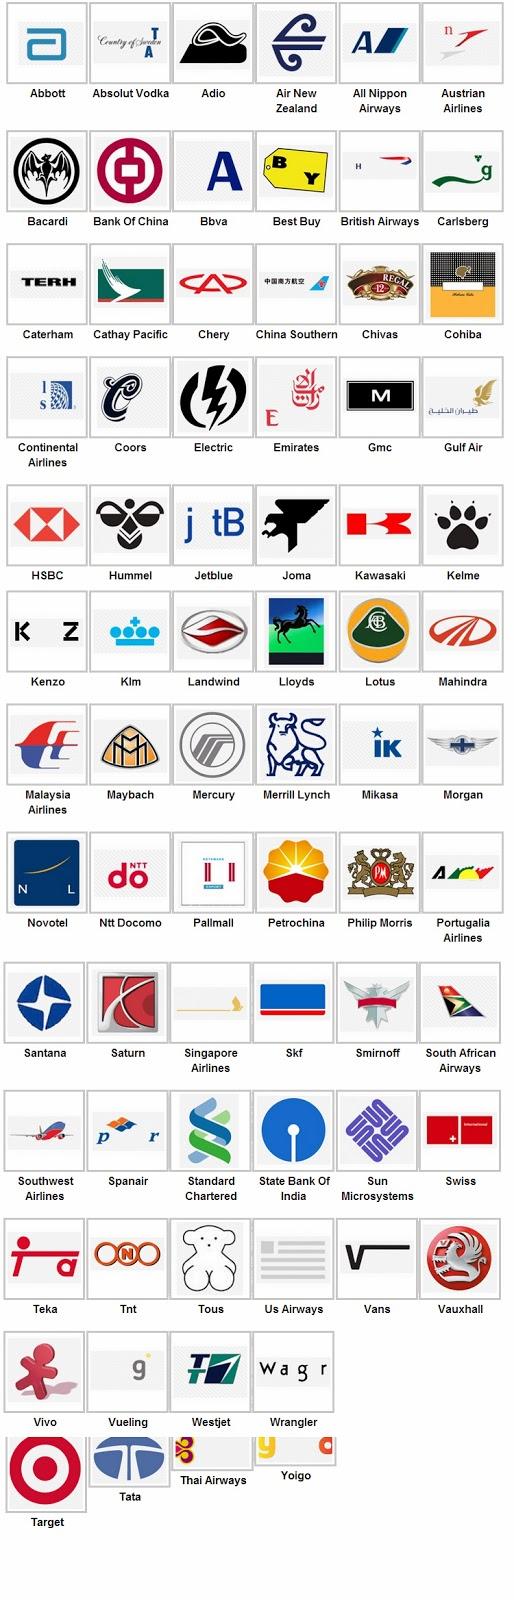 Alligator Logos Quiz All answers for logo quiz